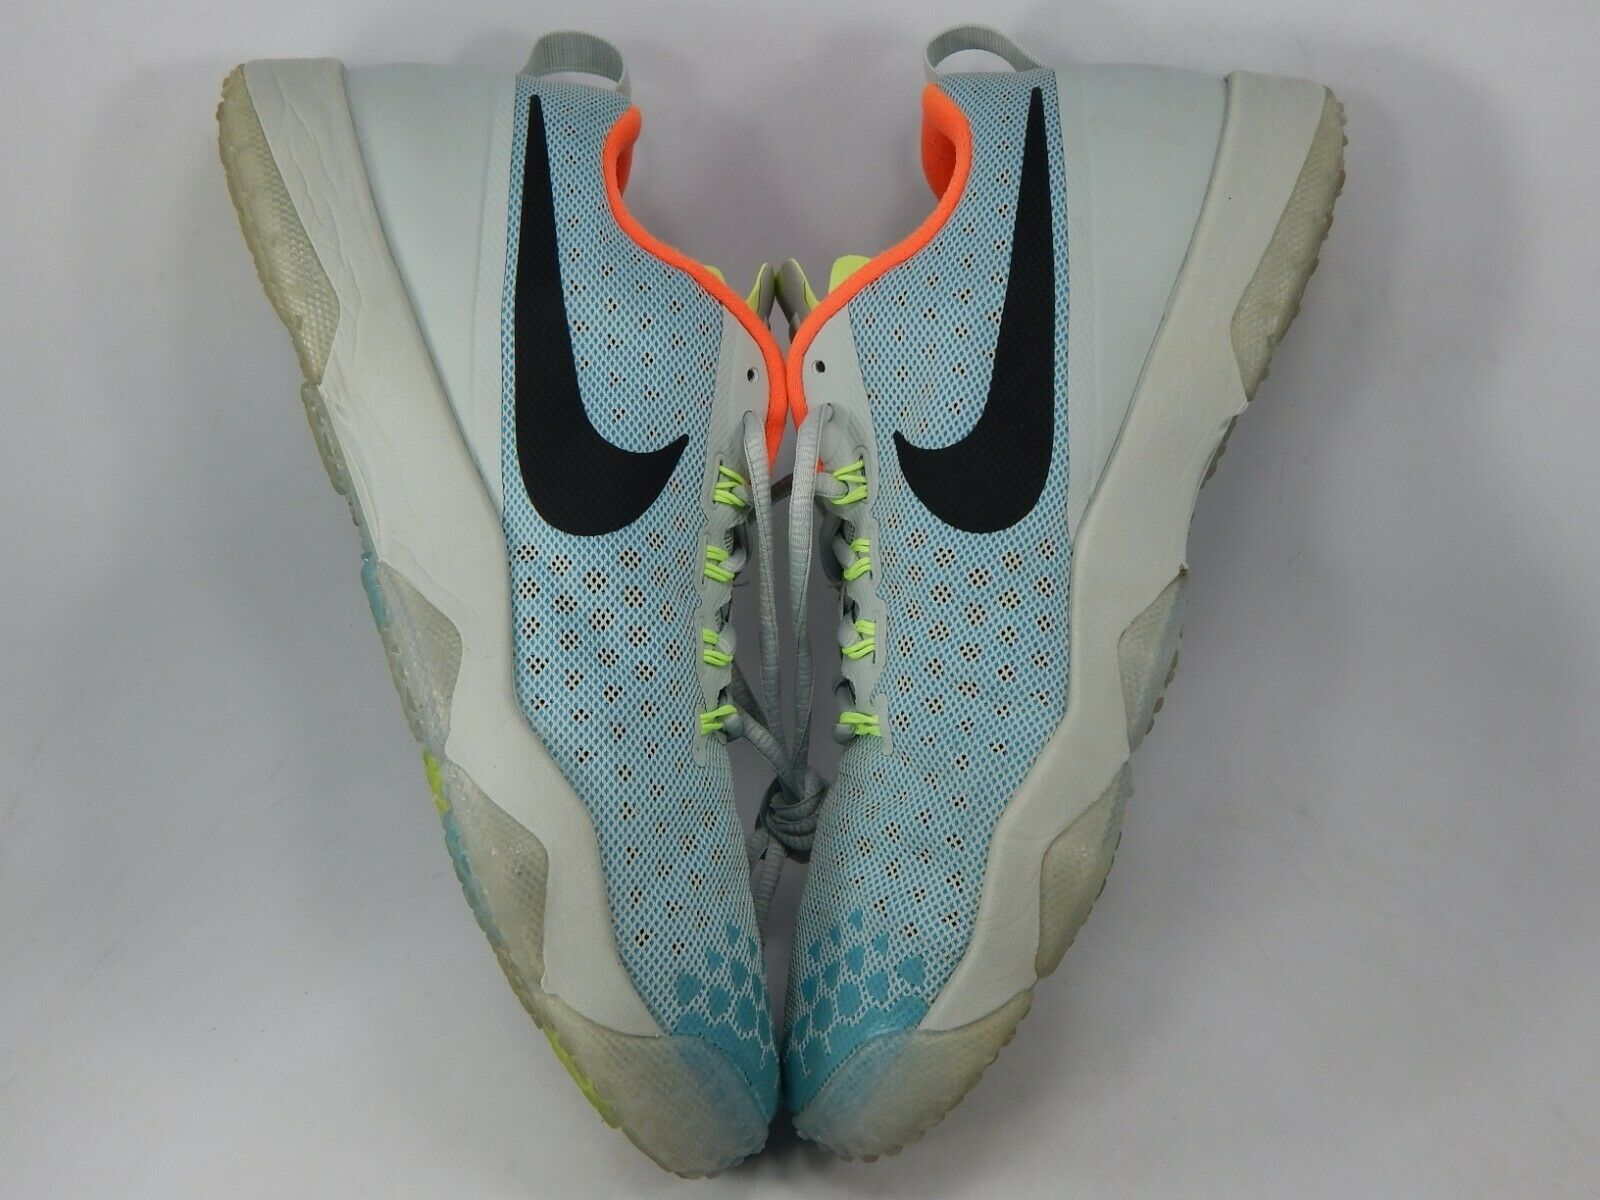 Nike Zoom Hypercross TR2 N7 Size 9.5 M (D) EU 43 Men's Training Shoes 822785-043